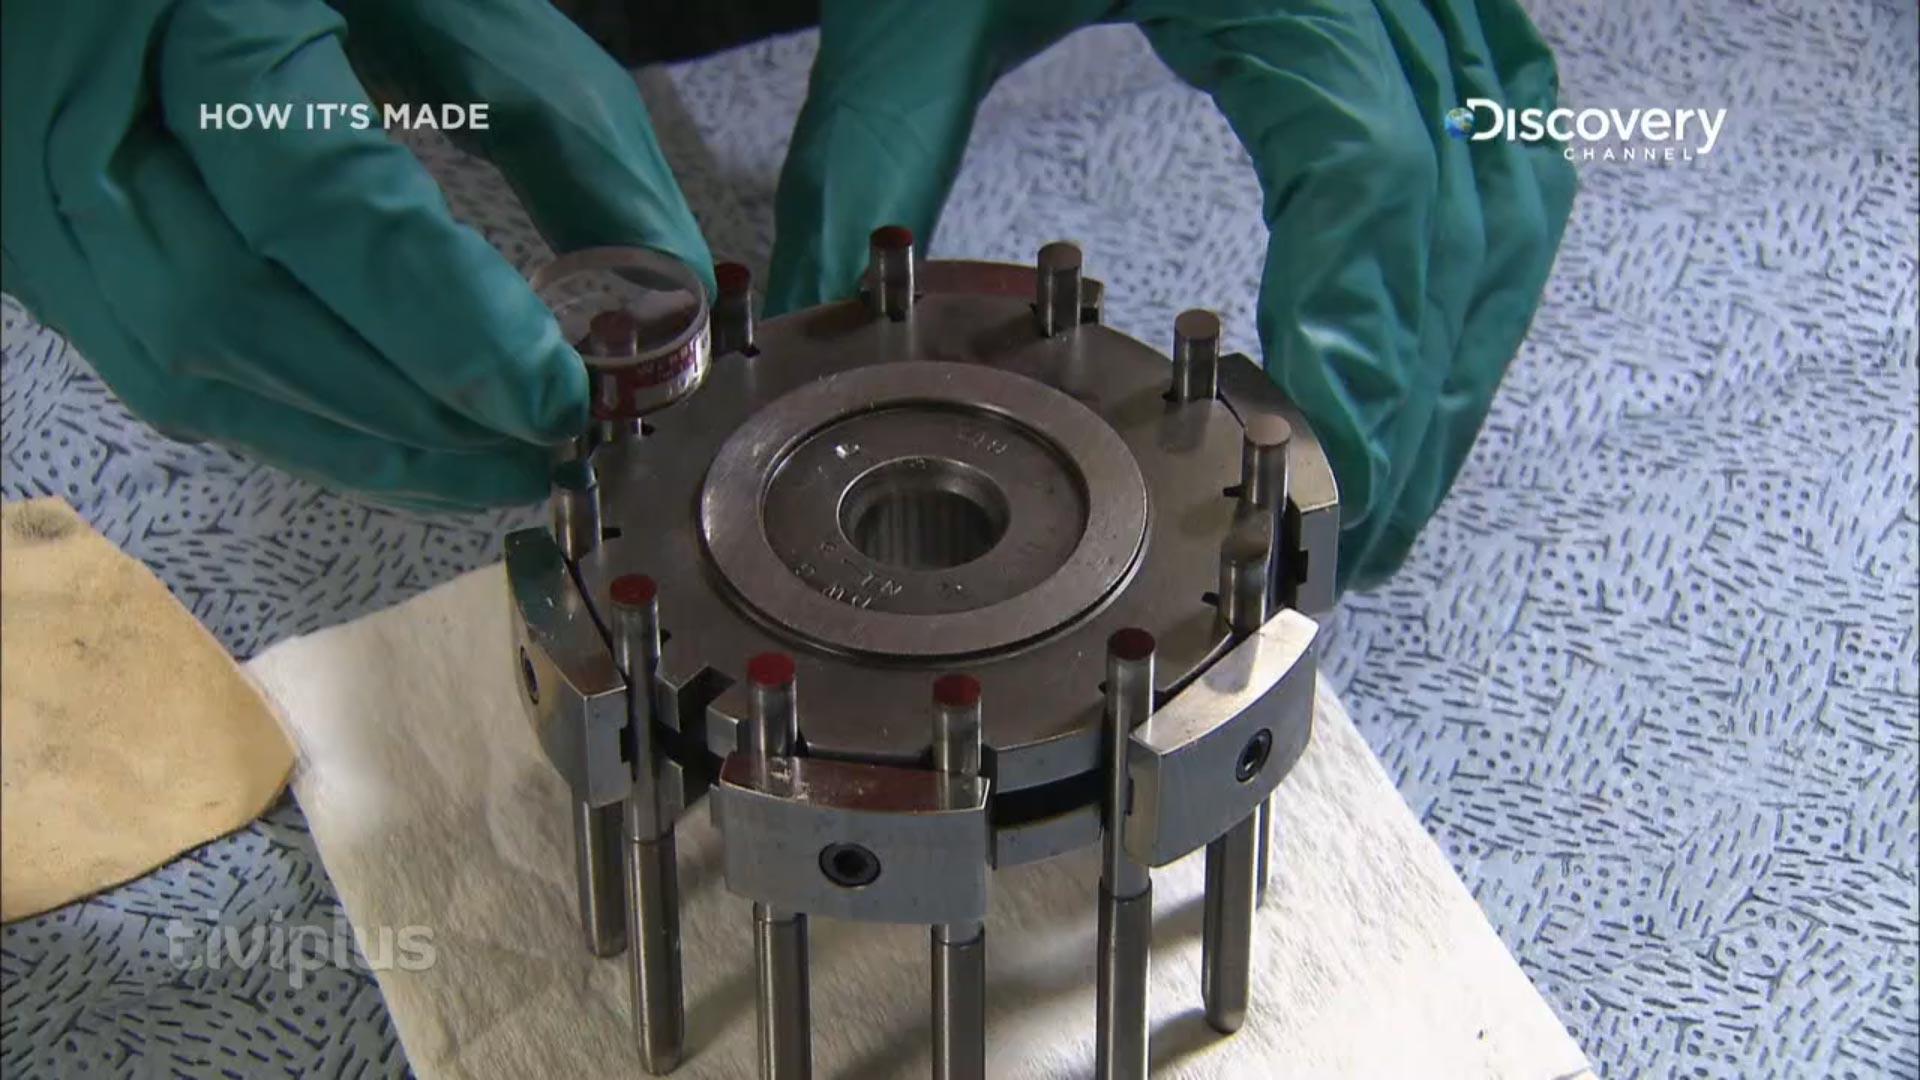 Frekuensi siaran Discovery Channel di satelit ChinaSat 11 Terbaru